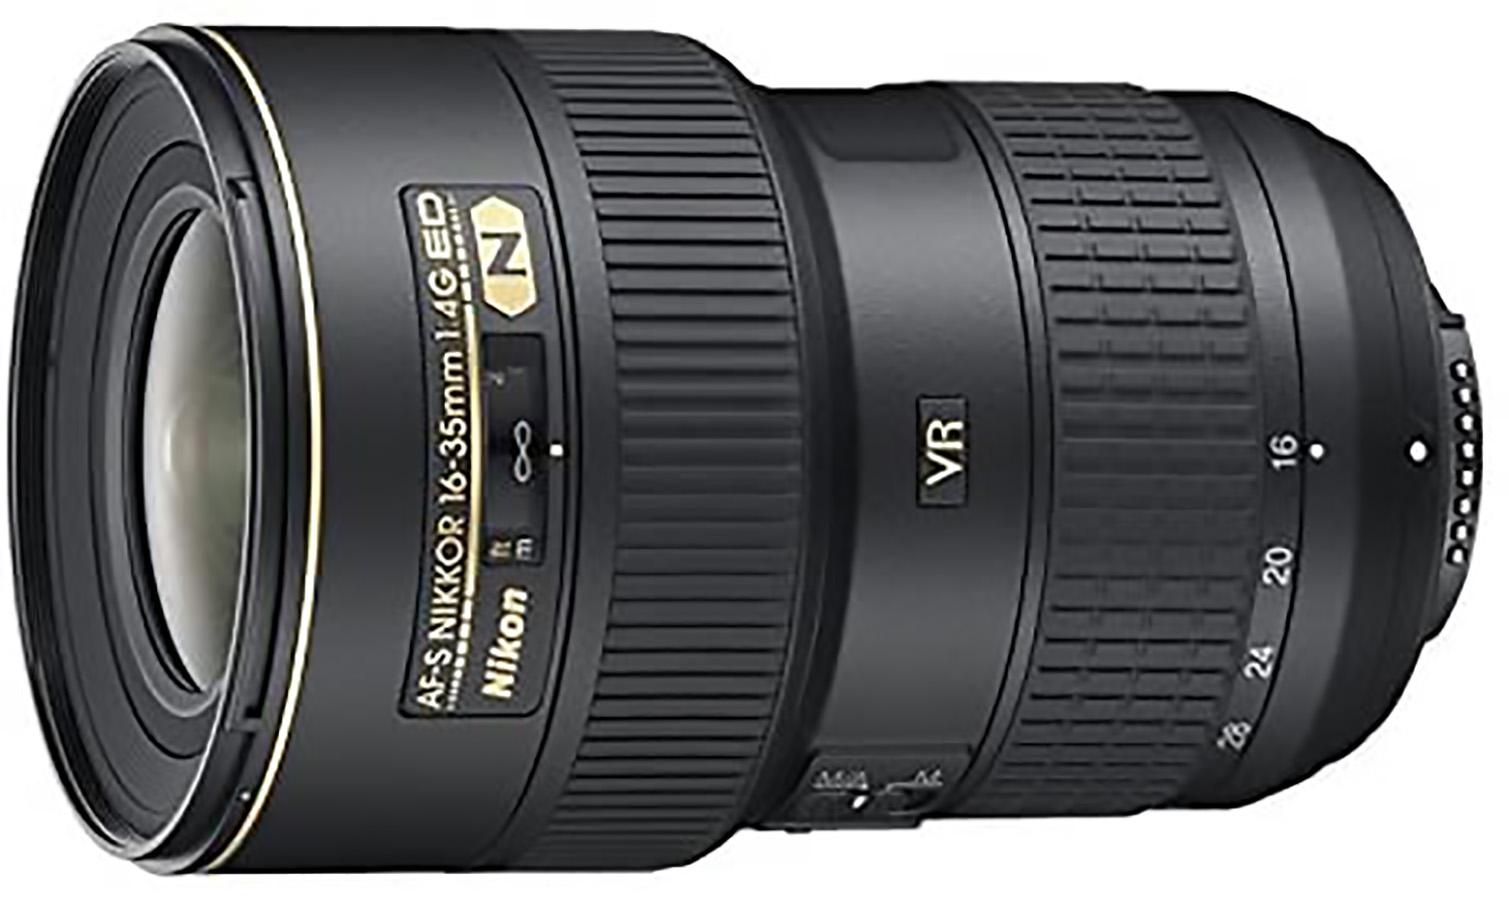 Nikon AF-S FX NIKKOR 16-35mm f:4G ED зум-объектив